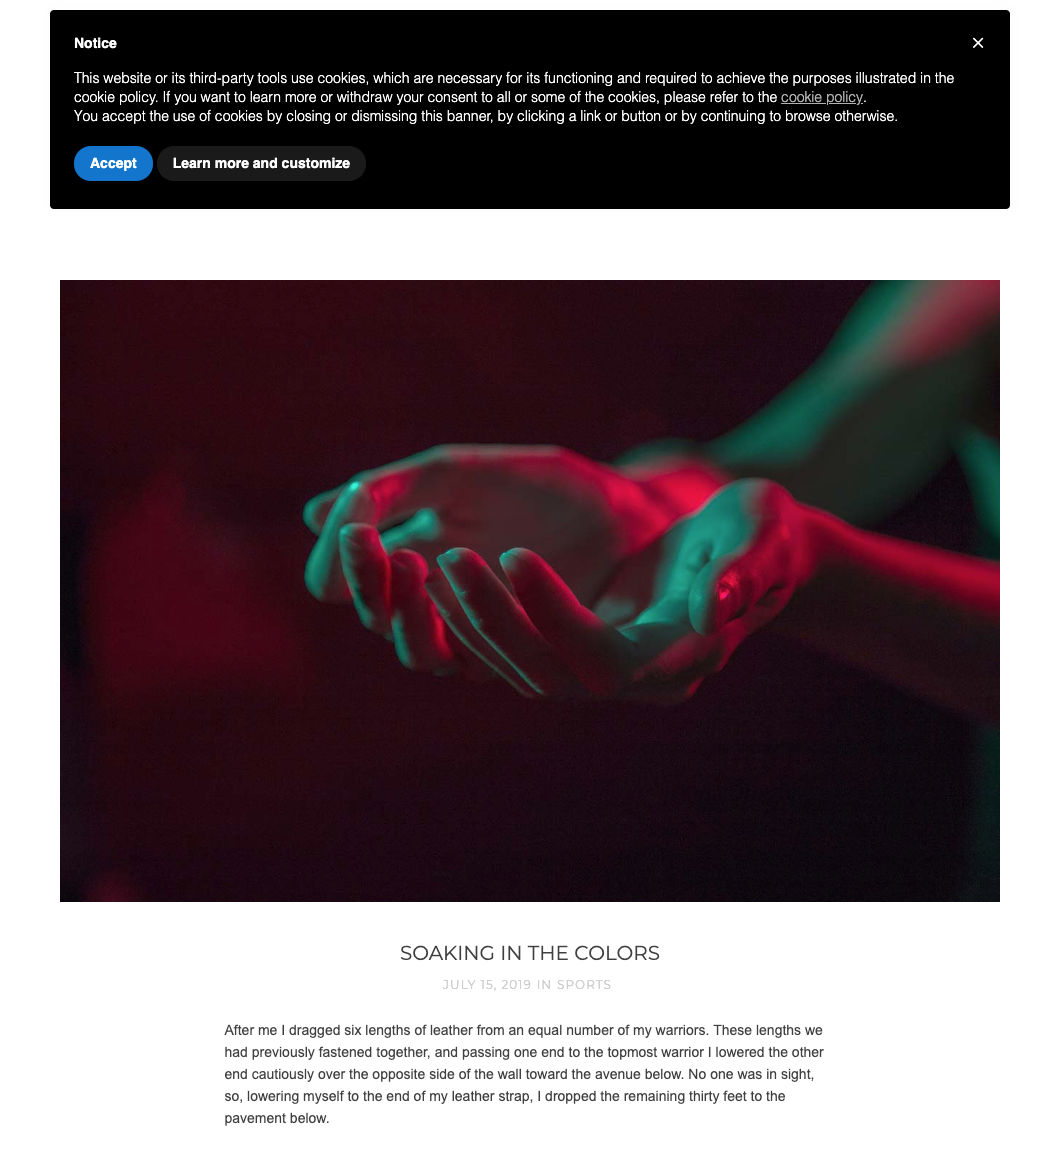 Banner de cookies de iubenda en un sitio web de Webflow